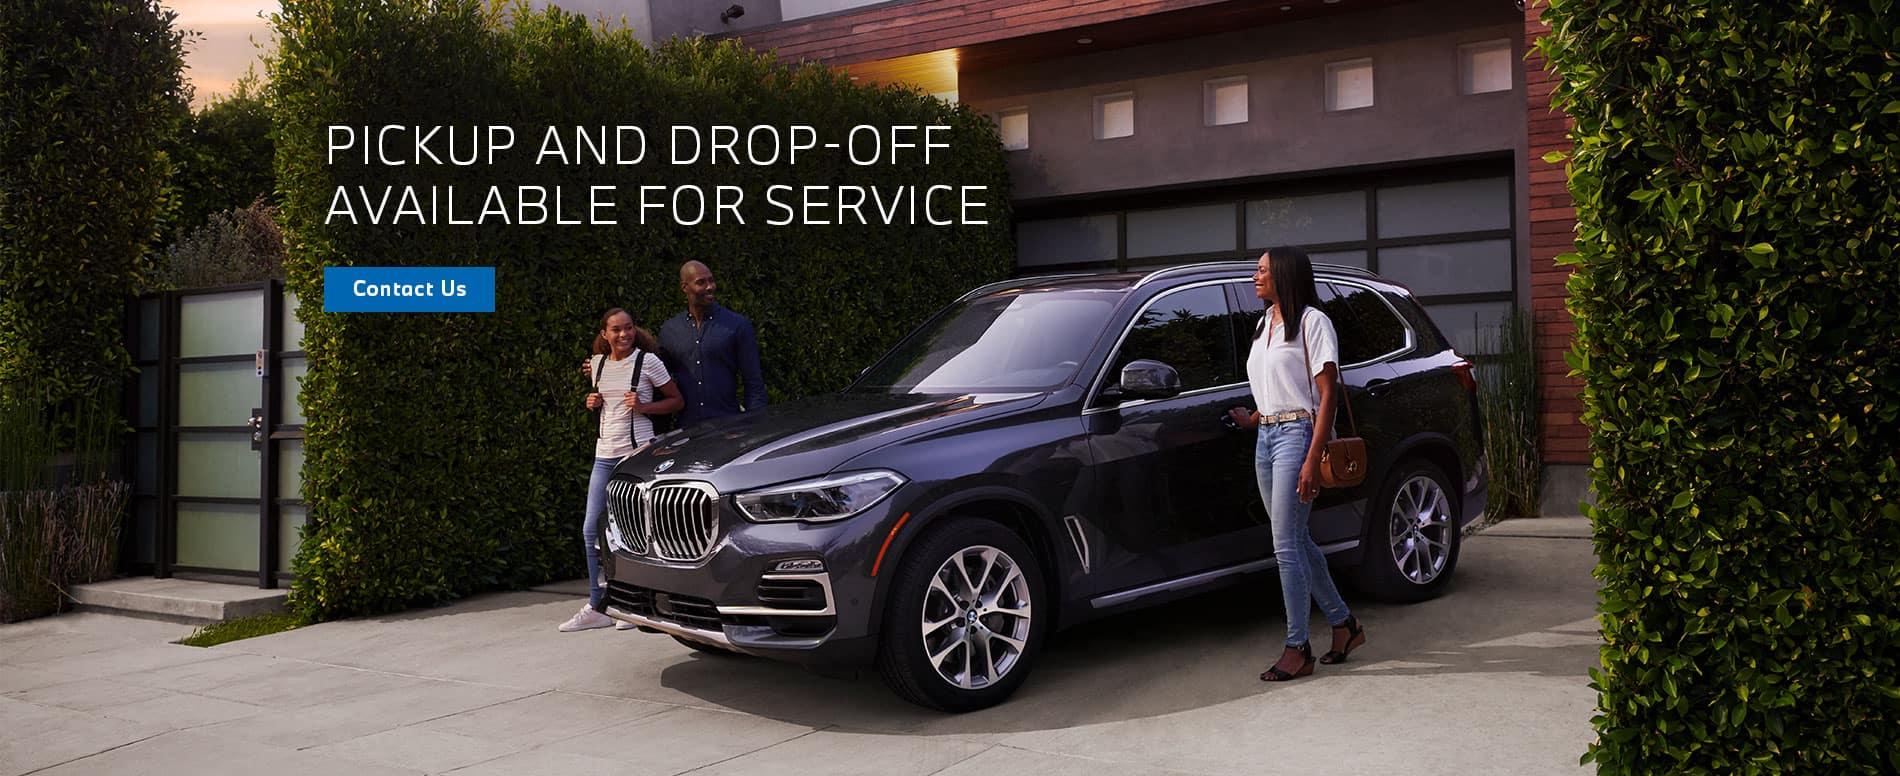 Pickup-and-Dropoff-Slide—BMW-of-Wichita-Falls